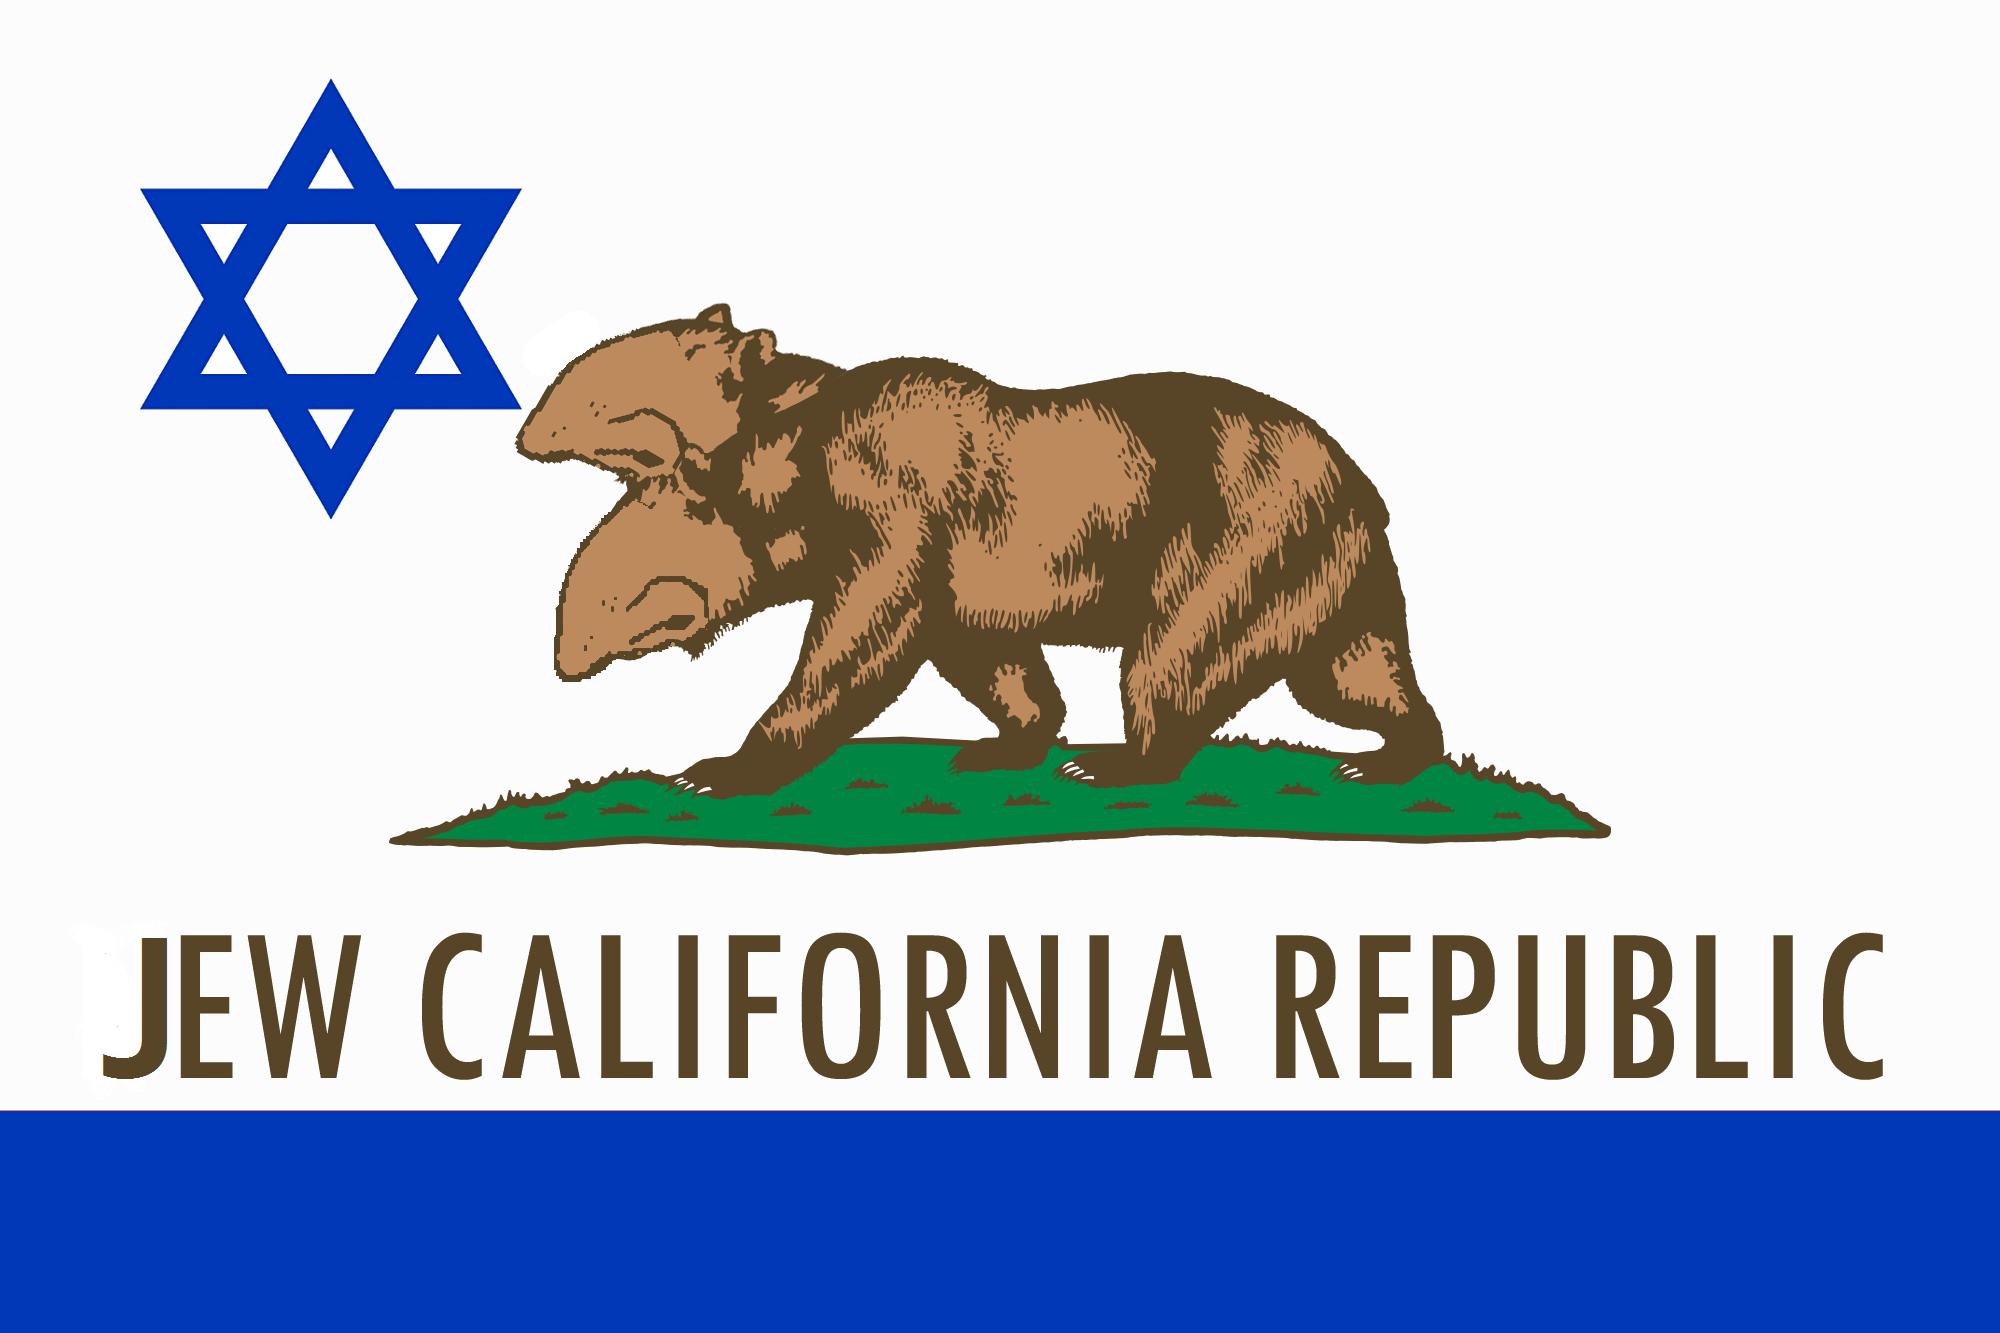 Daily reminder. . JEW CALIFORNIA REPUBLIC. Oh boy here we go Daily reminder JEW CALIFORNIA REPUBLIC Oh boy here we go